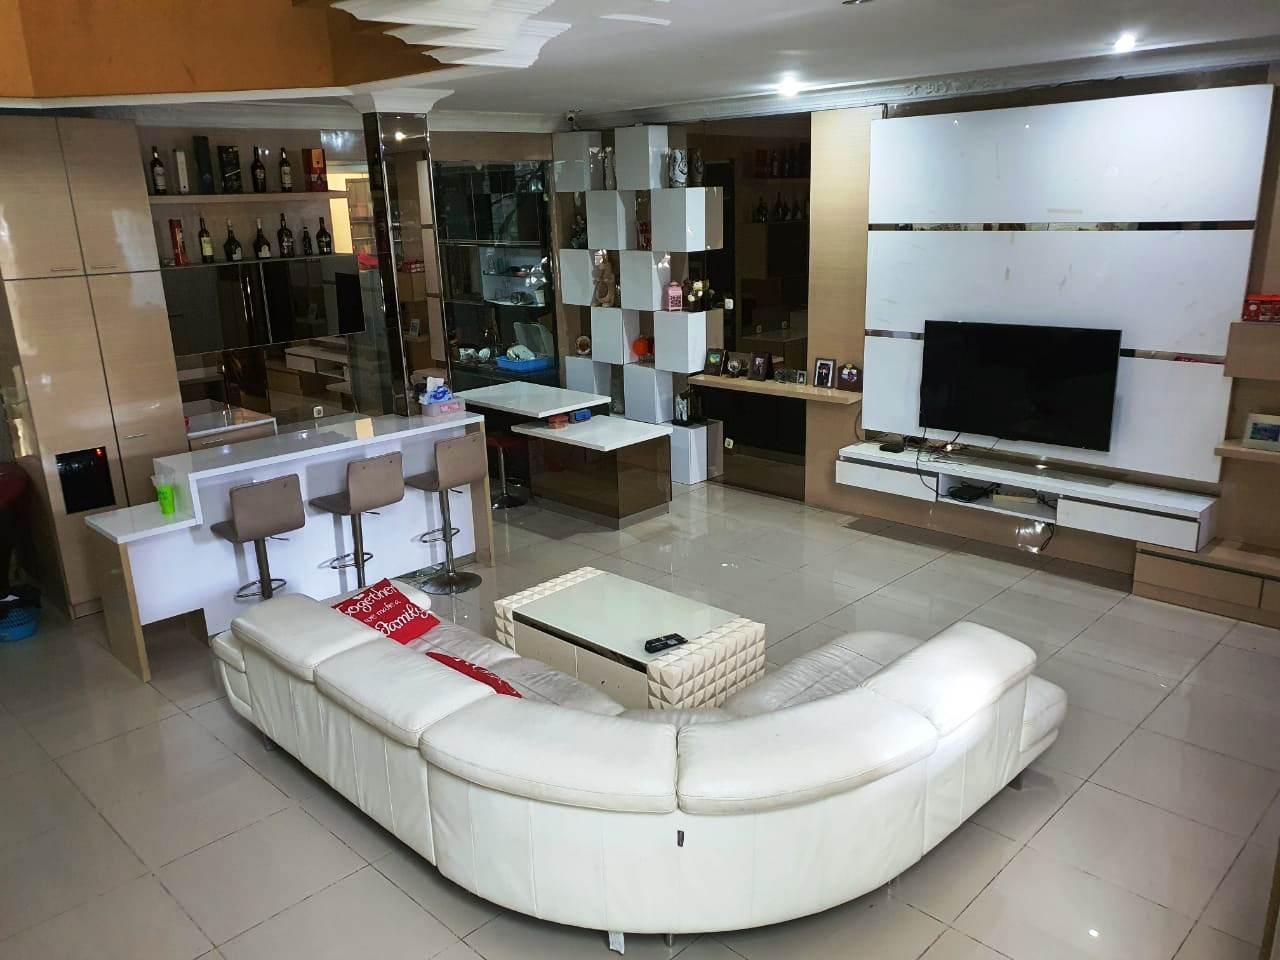 Rumah Mewah Hoek Fully Furnished Kelapa Gading Jakarta Utara - 6